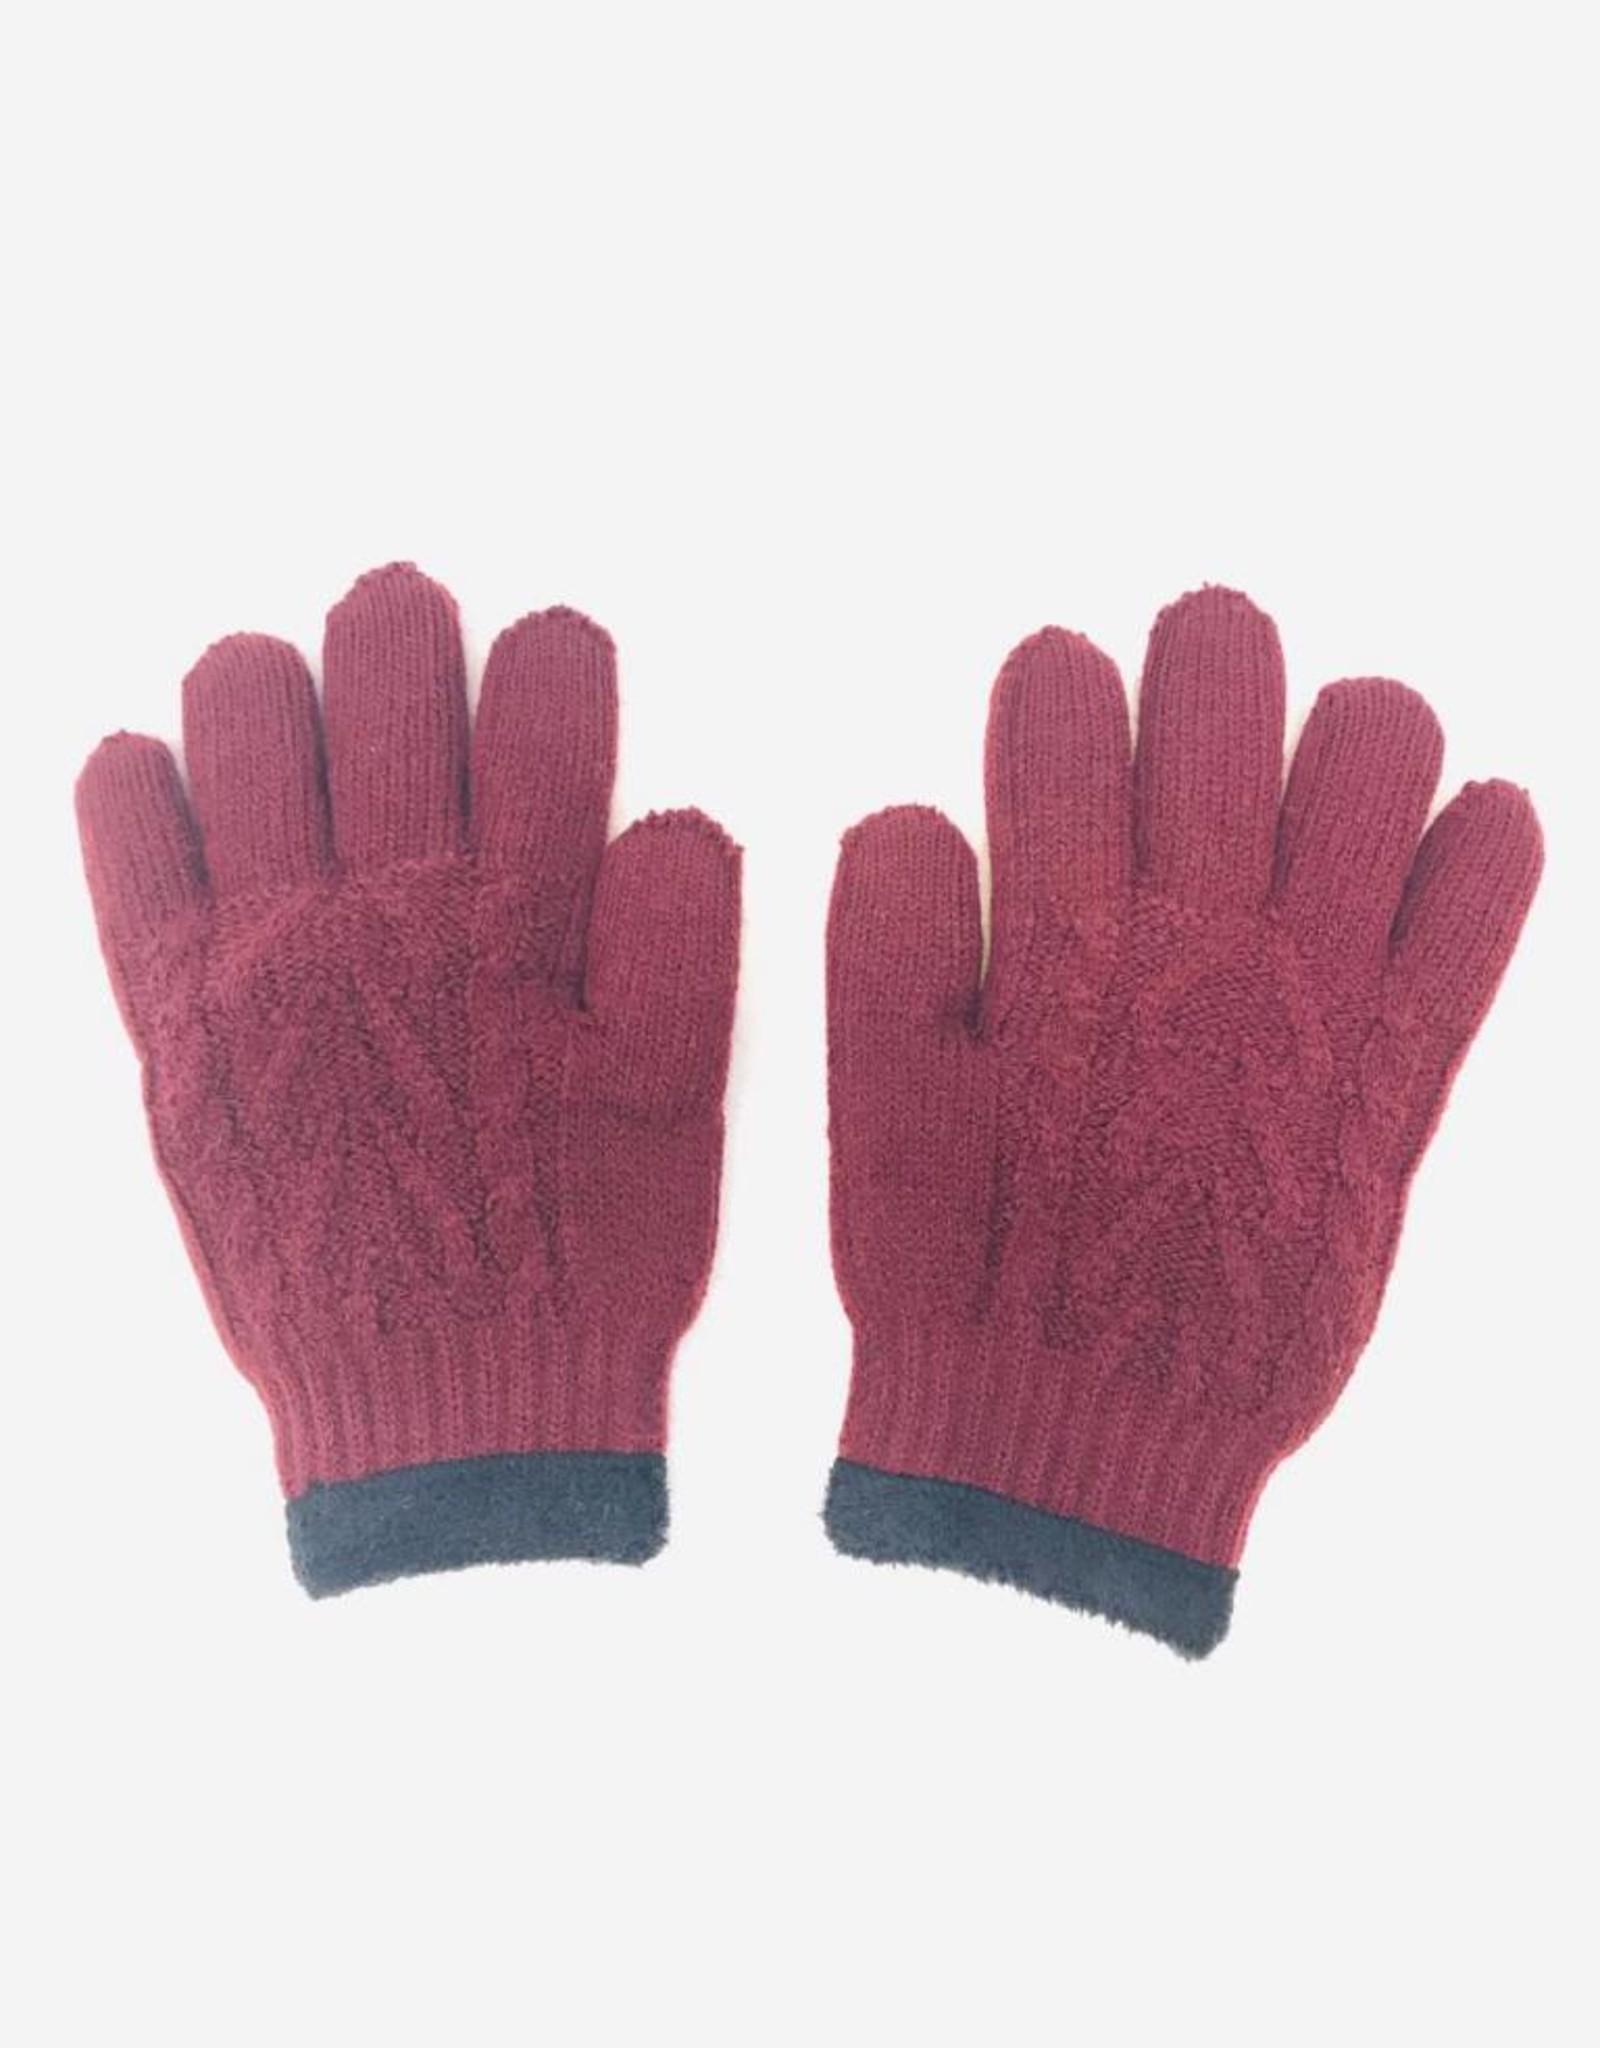 Dacee Design Waterproof Knit Glove